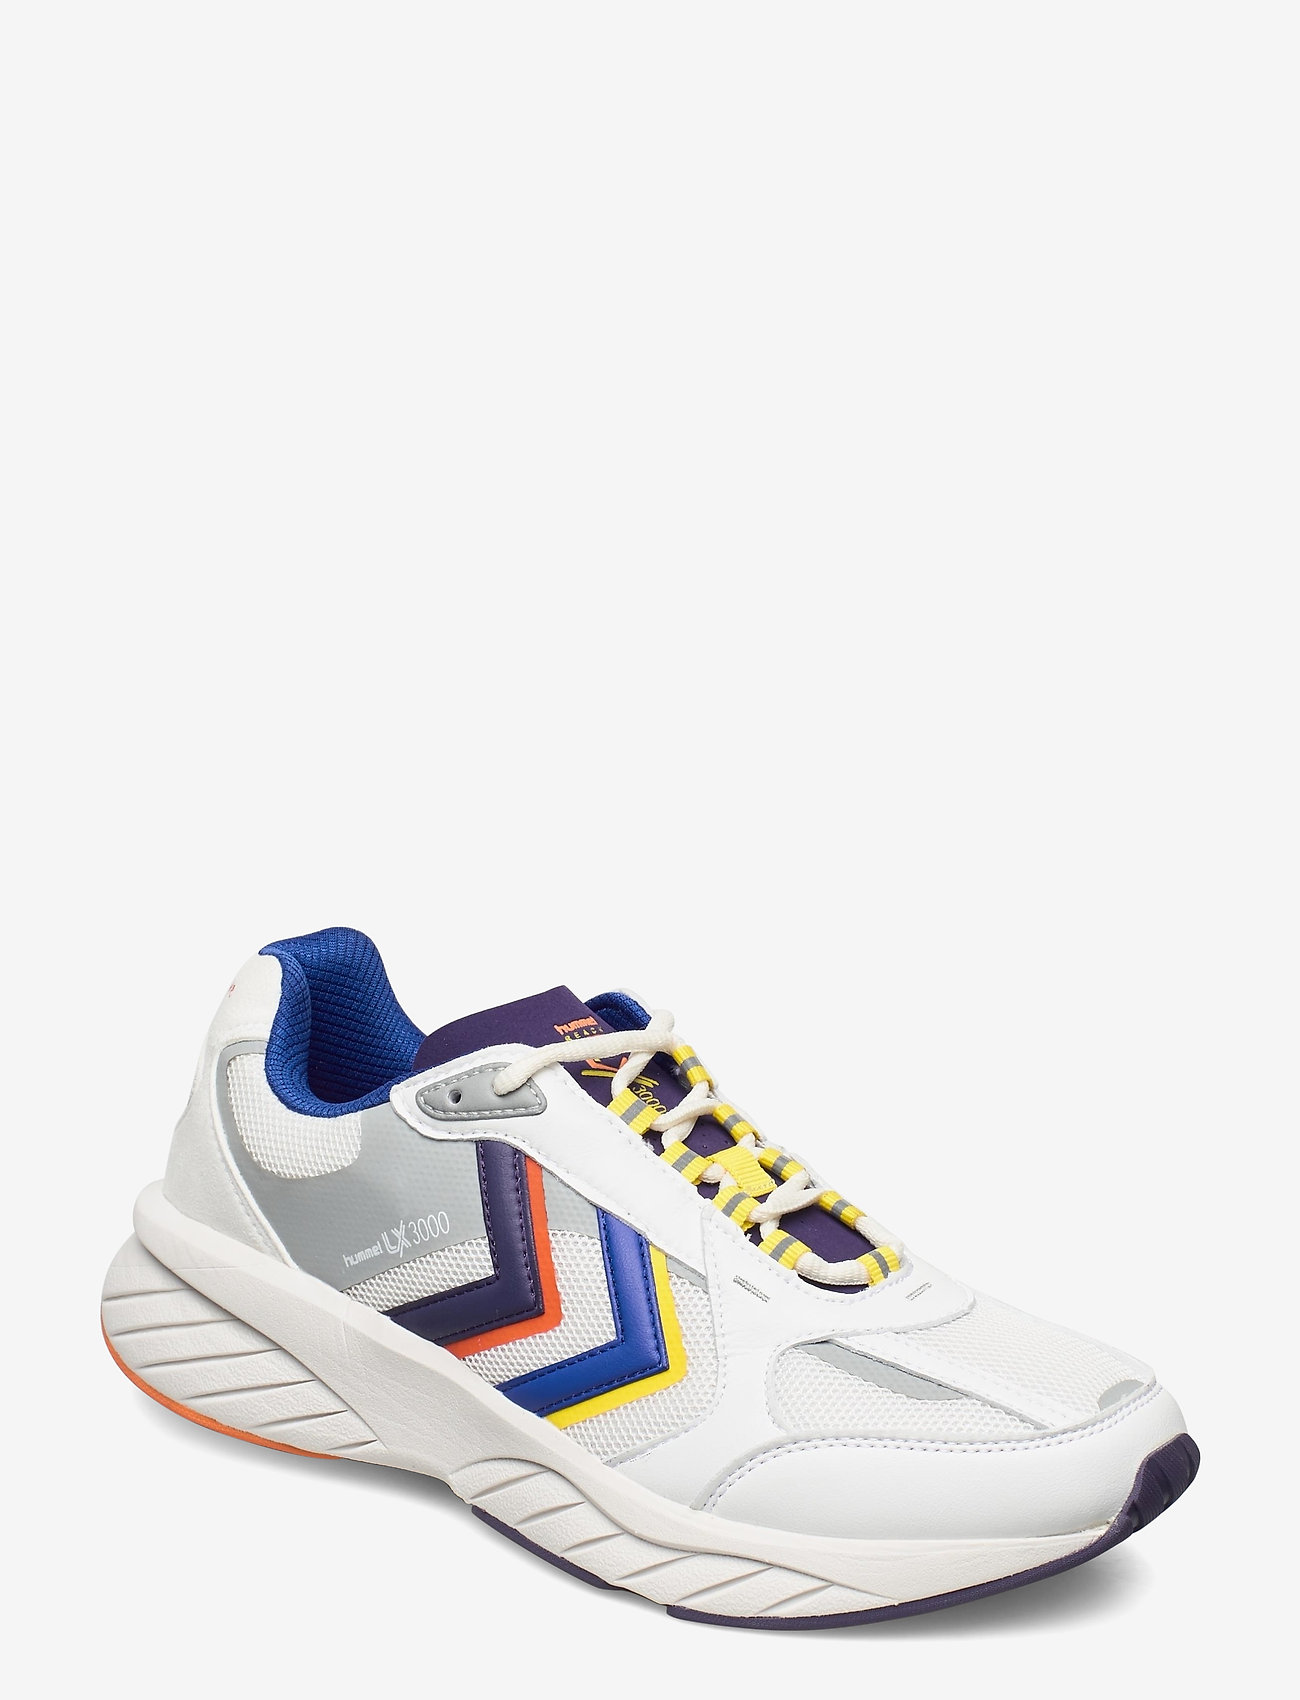 Hummel - REACH LX 3000 - laag sneakers - white/blackberry cordial - 0